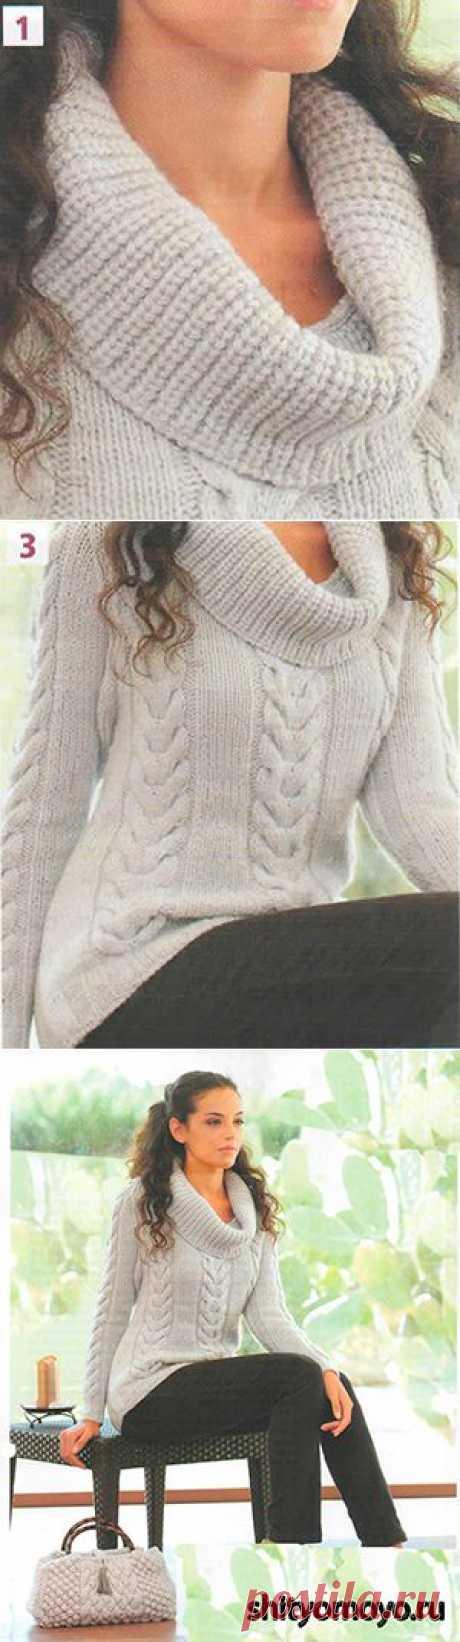 Серый пуловер, связанный спицами.